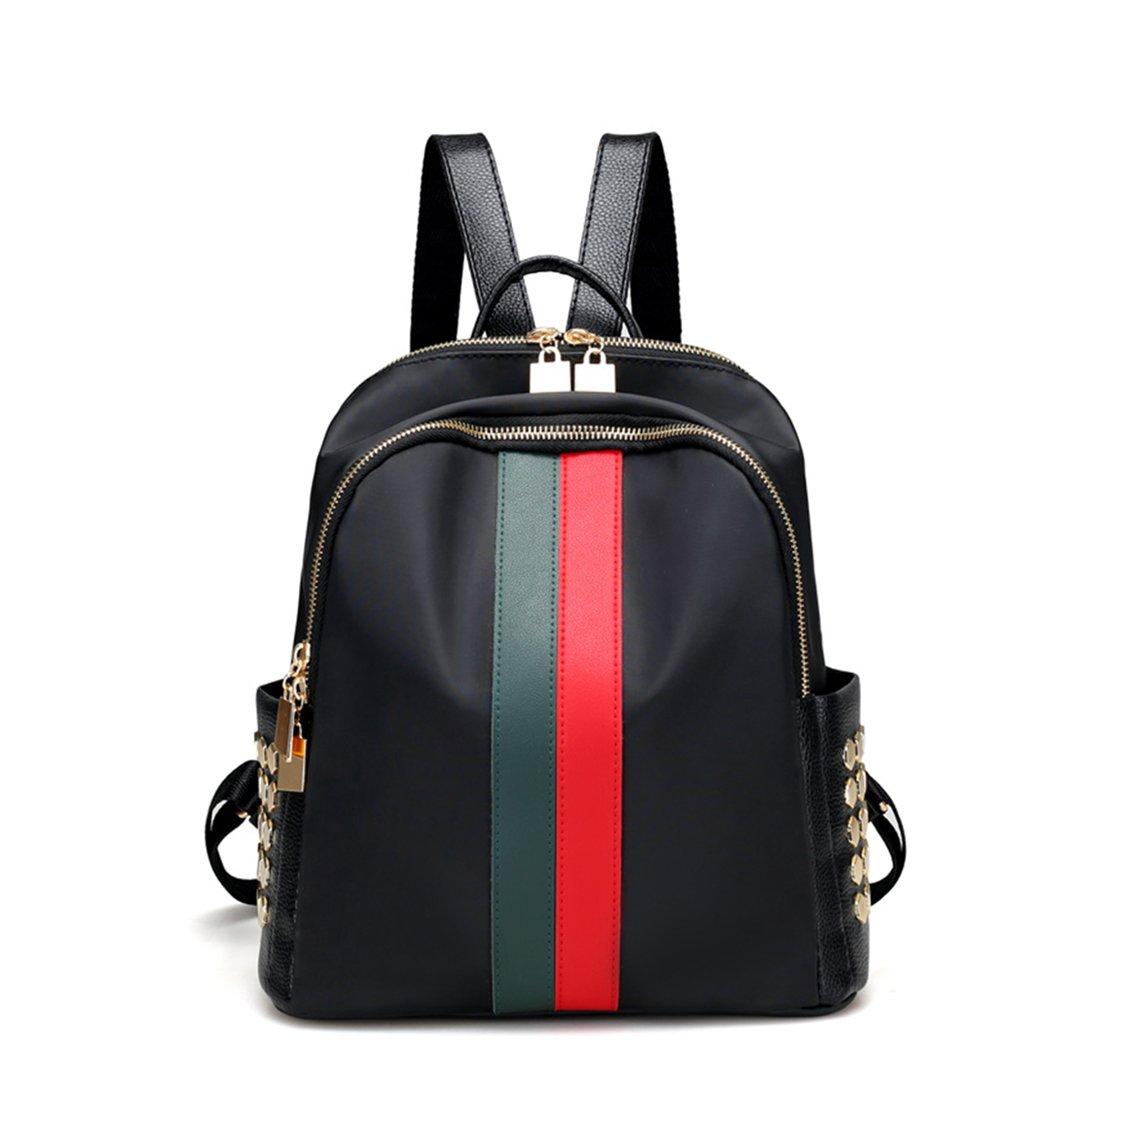 Leparvi Fashion Oxford Luxury Designer Small Women Backpack Bag Ladies Teenager Tote Handbag Purse (Red-green)